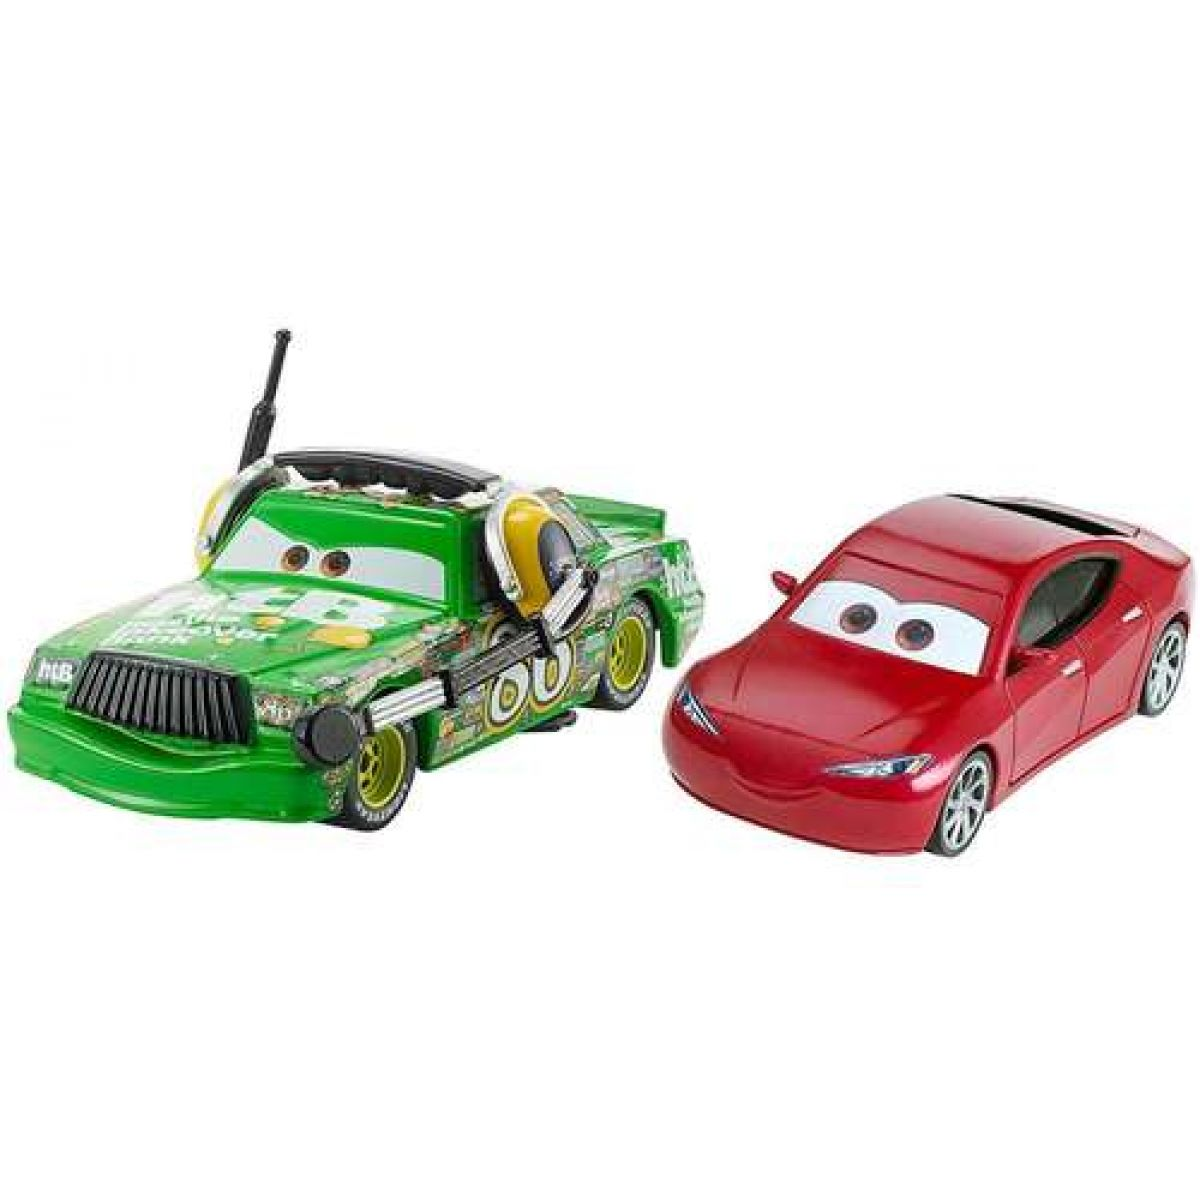 Mattel Cars 3 auta 2 ks Chick